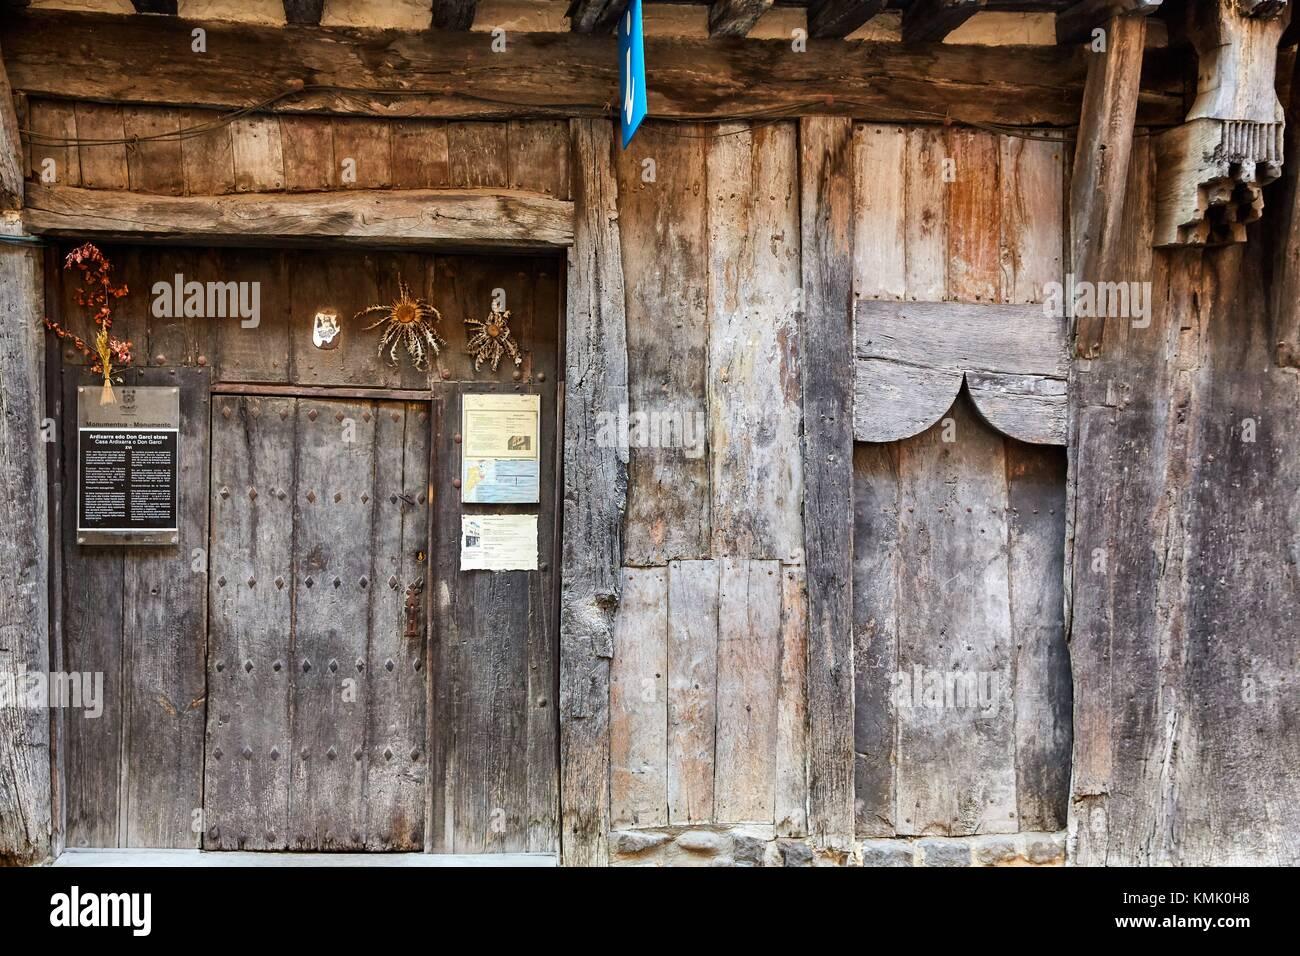 Ardixarra House, Interpretation Center of the Middle Ages, Medieval town, Segura, Gipuzkoa, Basque Country, Spain, - Stock Image